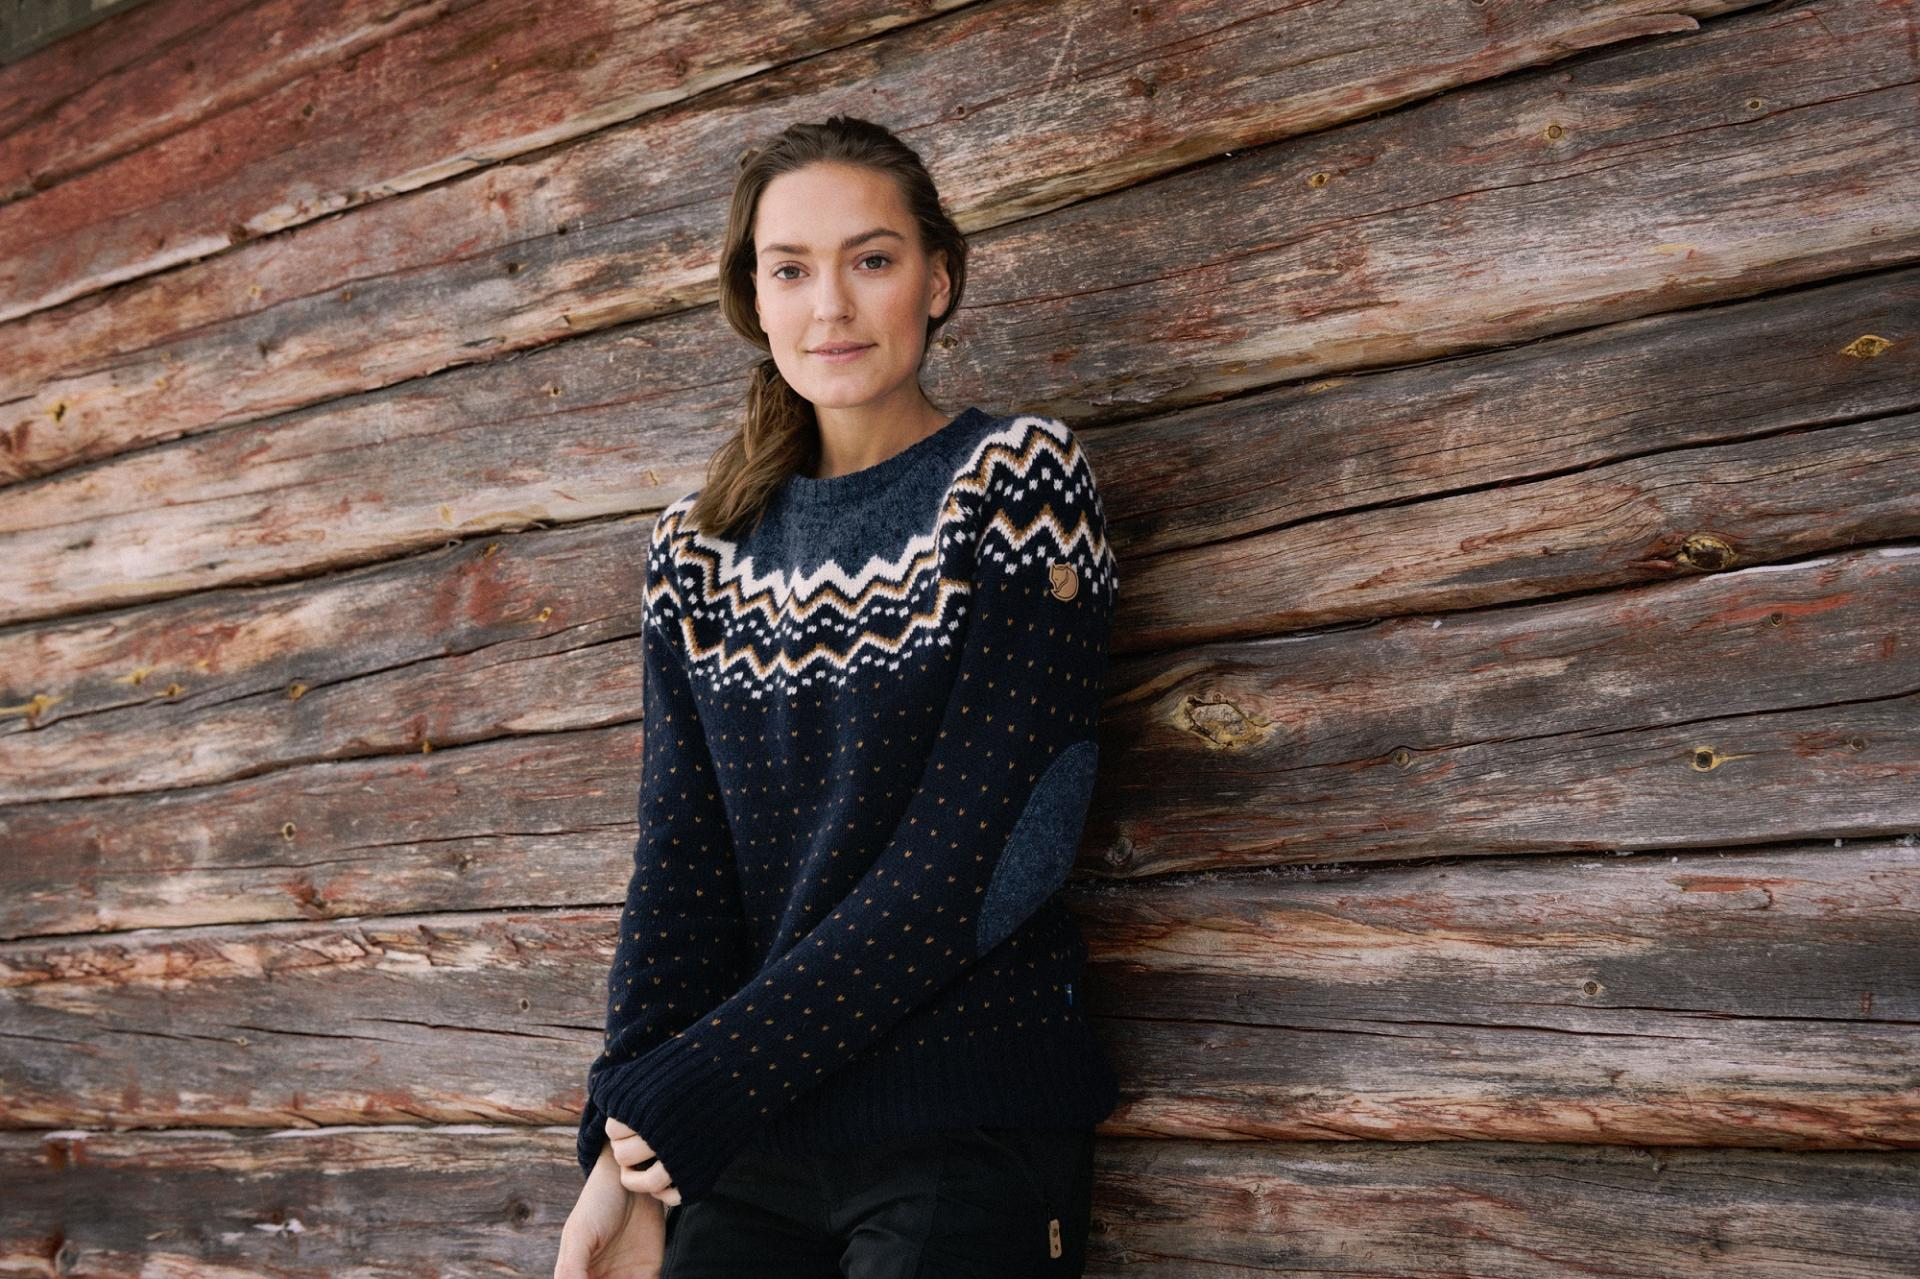 Fjallraven Ovik knit sweater: Christmas Gift Guide